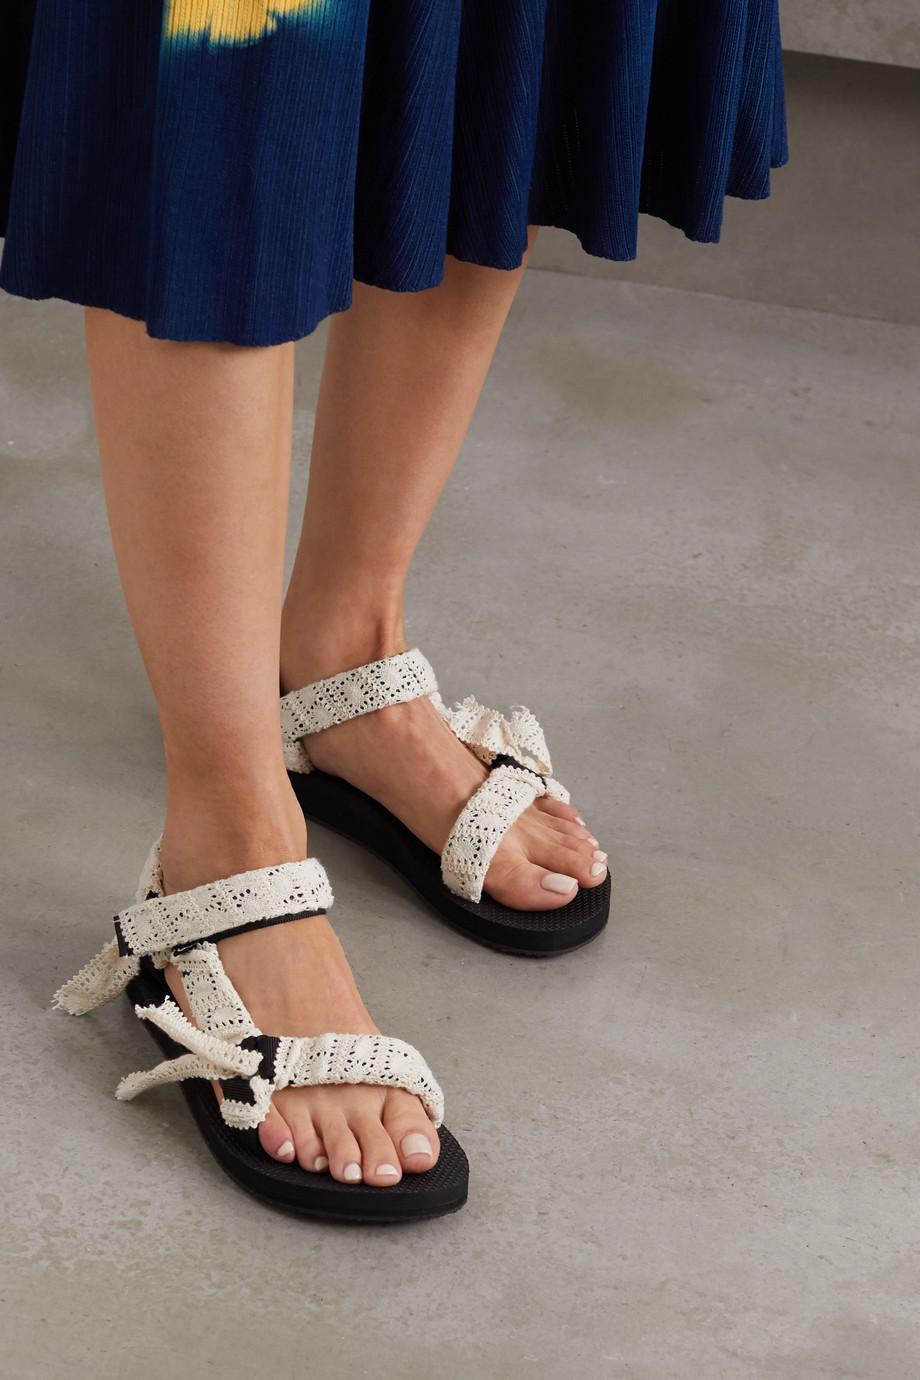 Arizona Love Trekky Fun 钩编蕾丝帆布厚底凉鞋